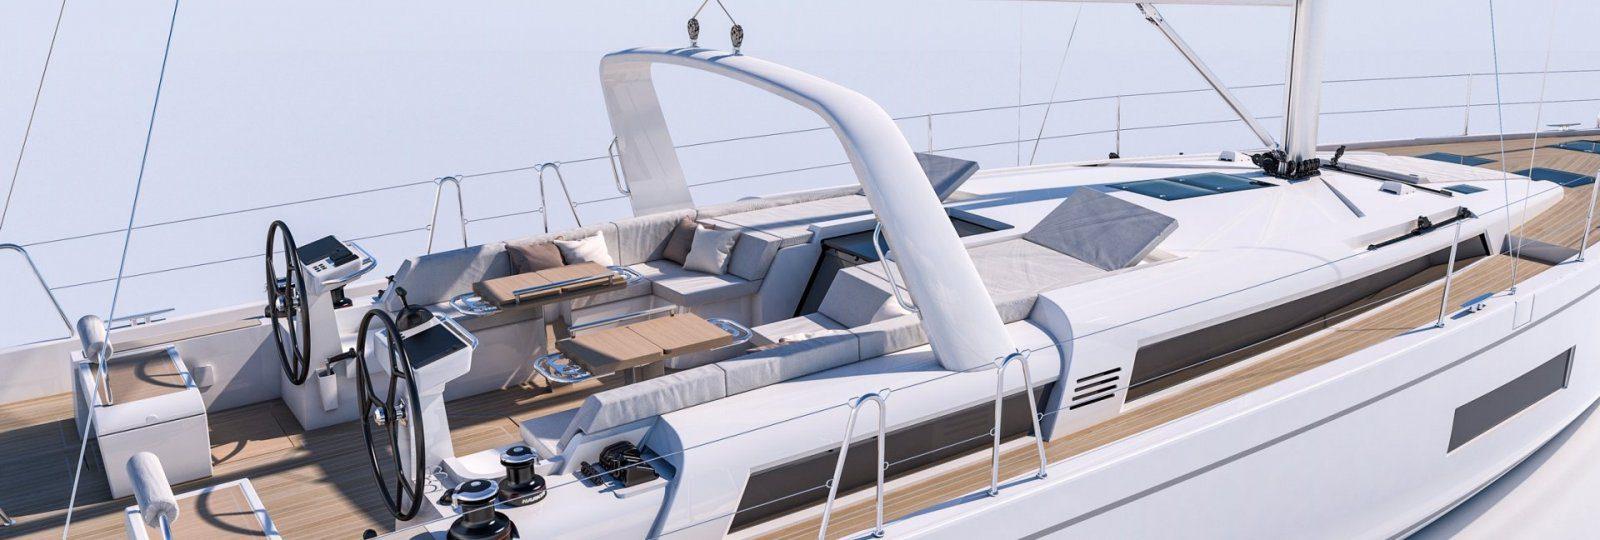 Beneteau Oceanis Yacht 54 cockpit